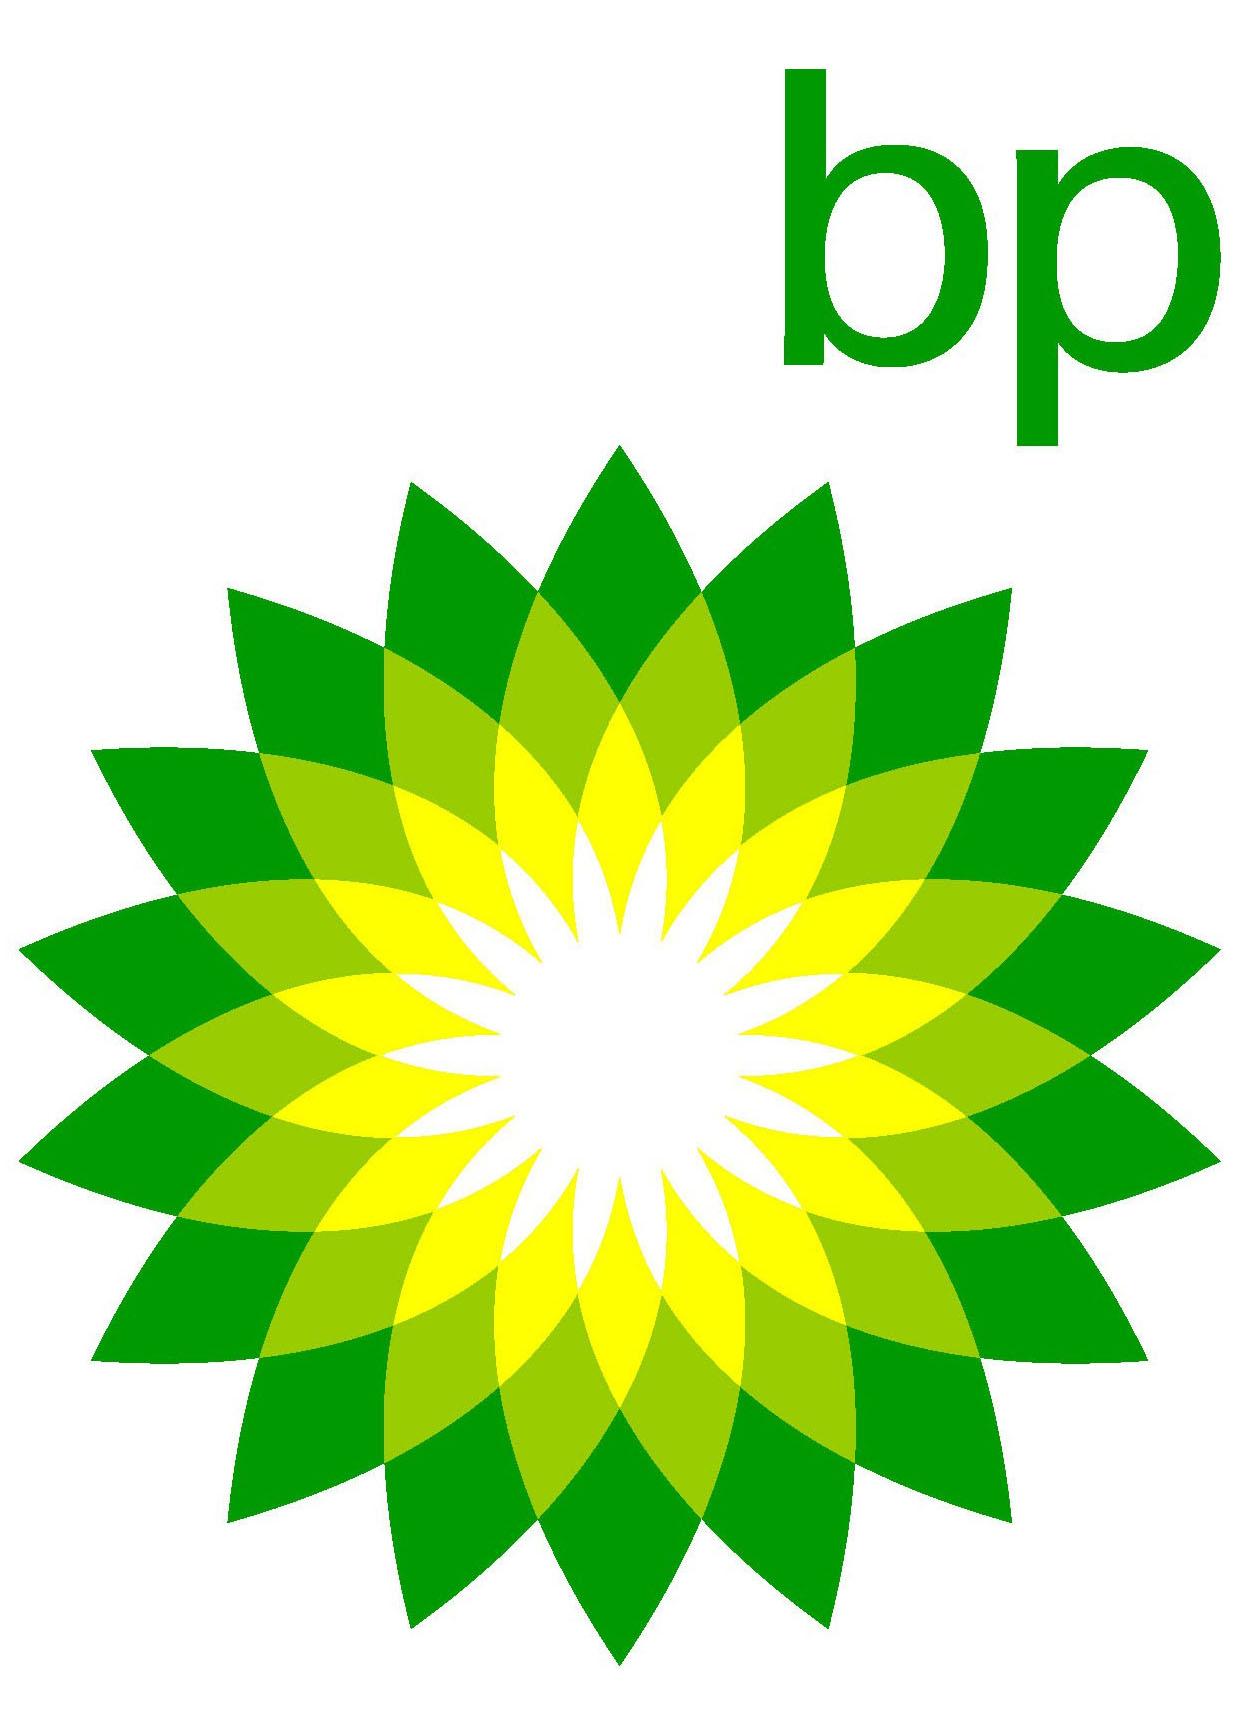 http://www.2b1stconsulting.com/wp-content/uploads/2012/09/BP-Logo.jpg